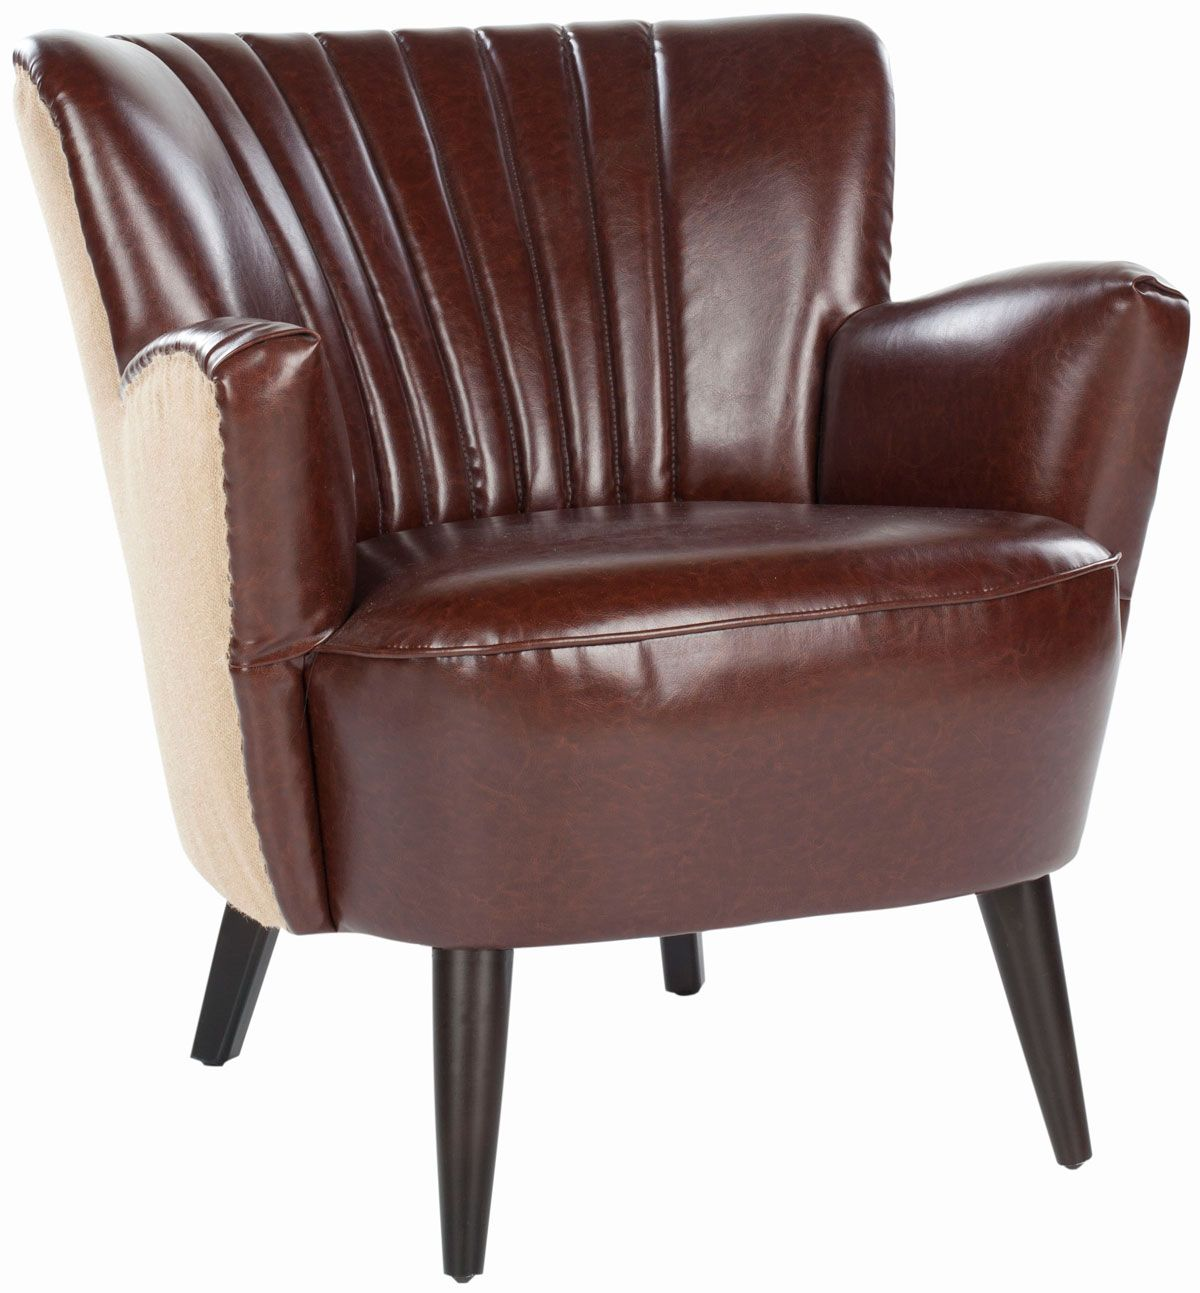 Safavieh's Cooper Arm Chair SKU: MCR4612A Color: Brown/ Beige